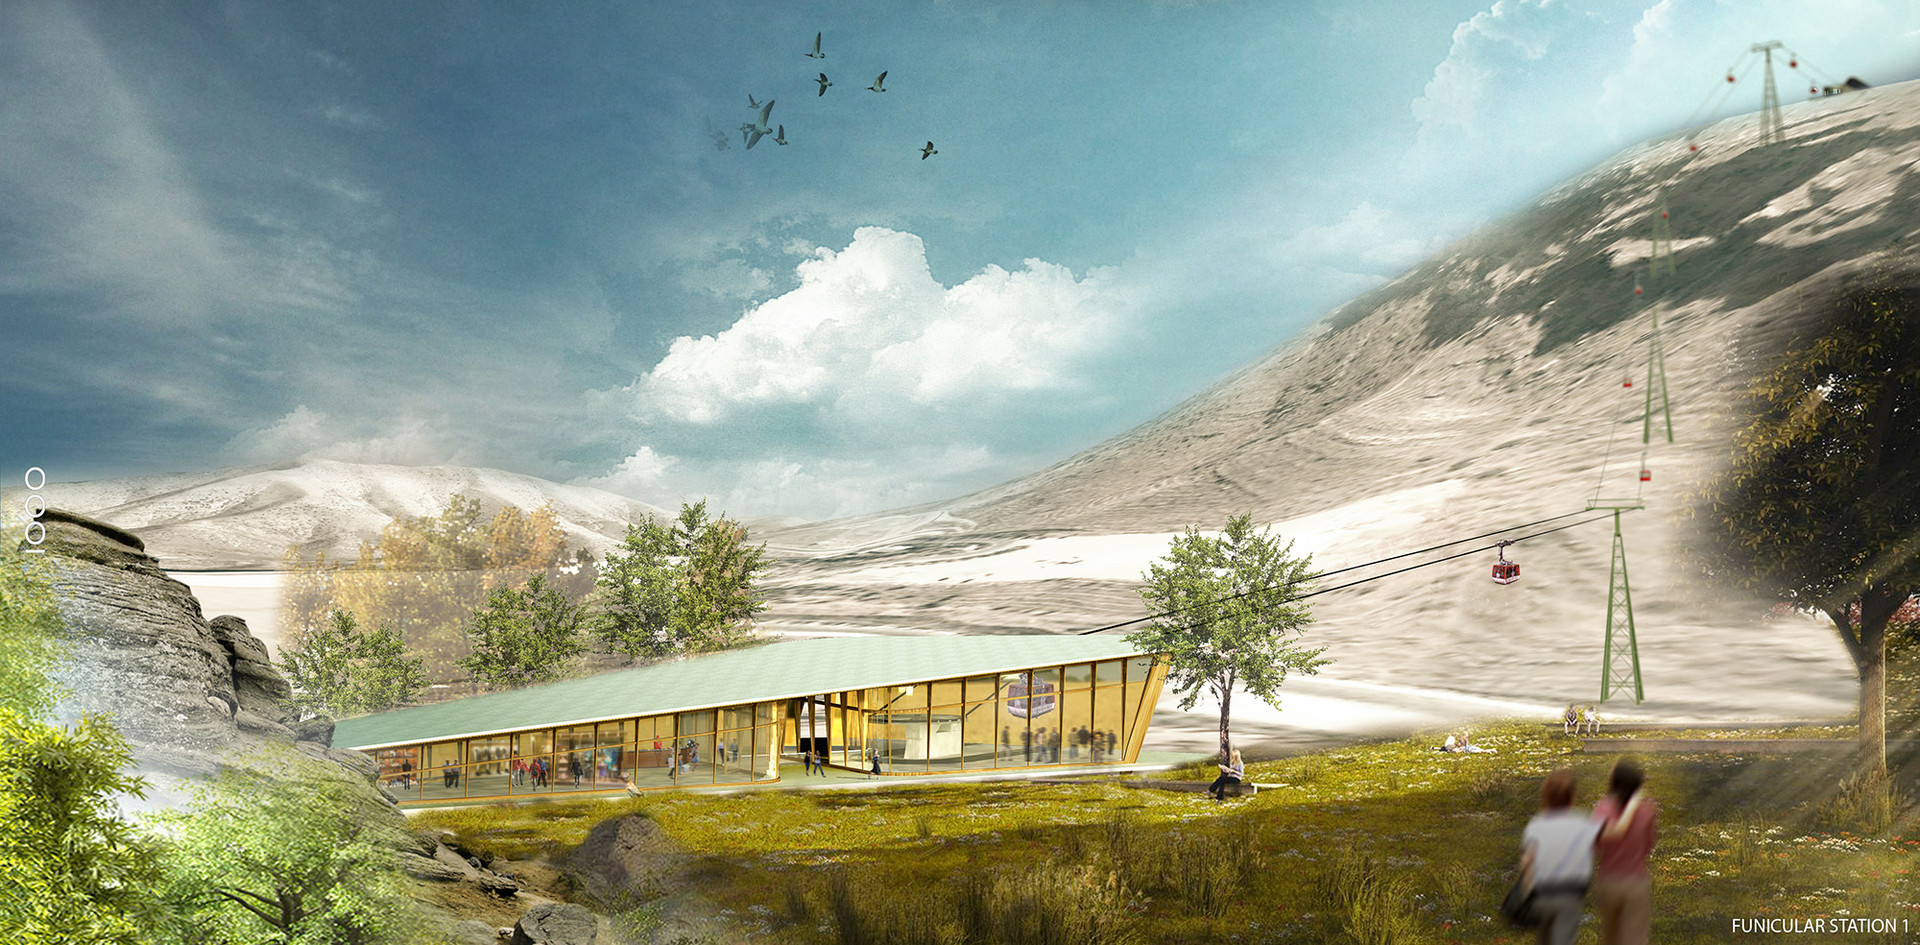 Sheda View - Touristic Complex   1000 years old architecture workshop   Dohuk - Kurdistan